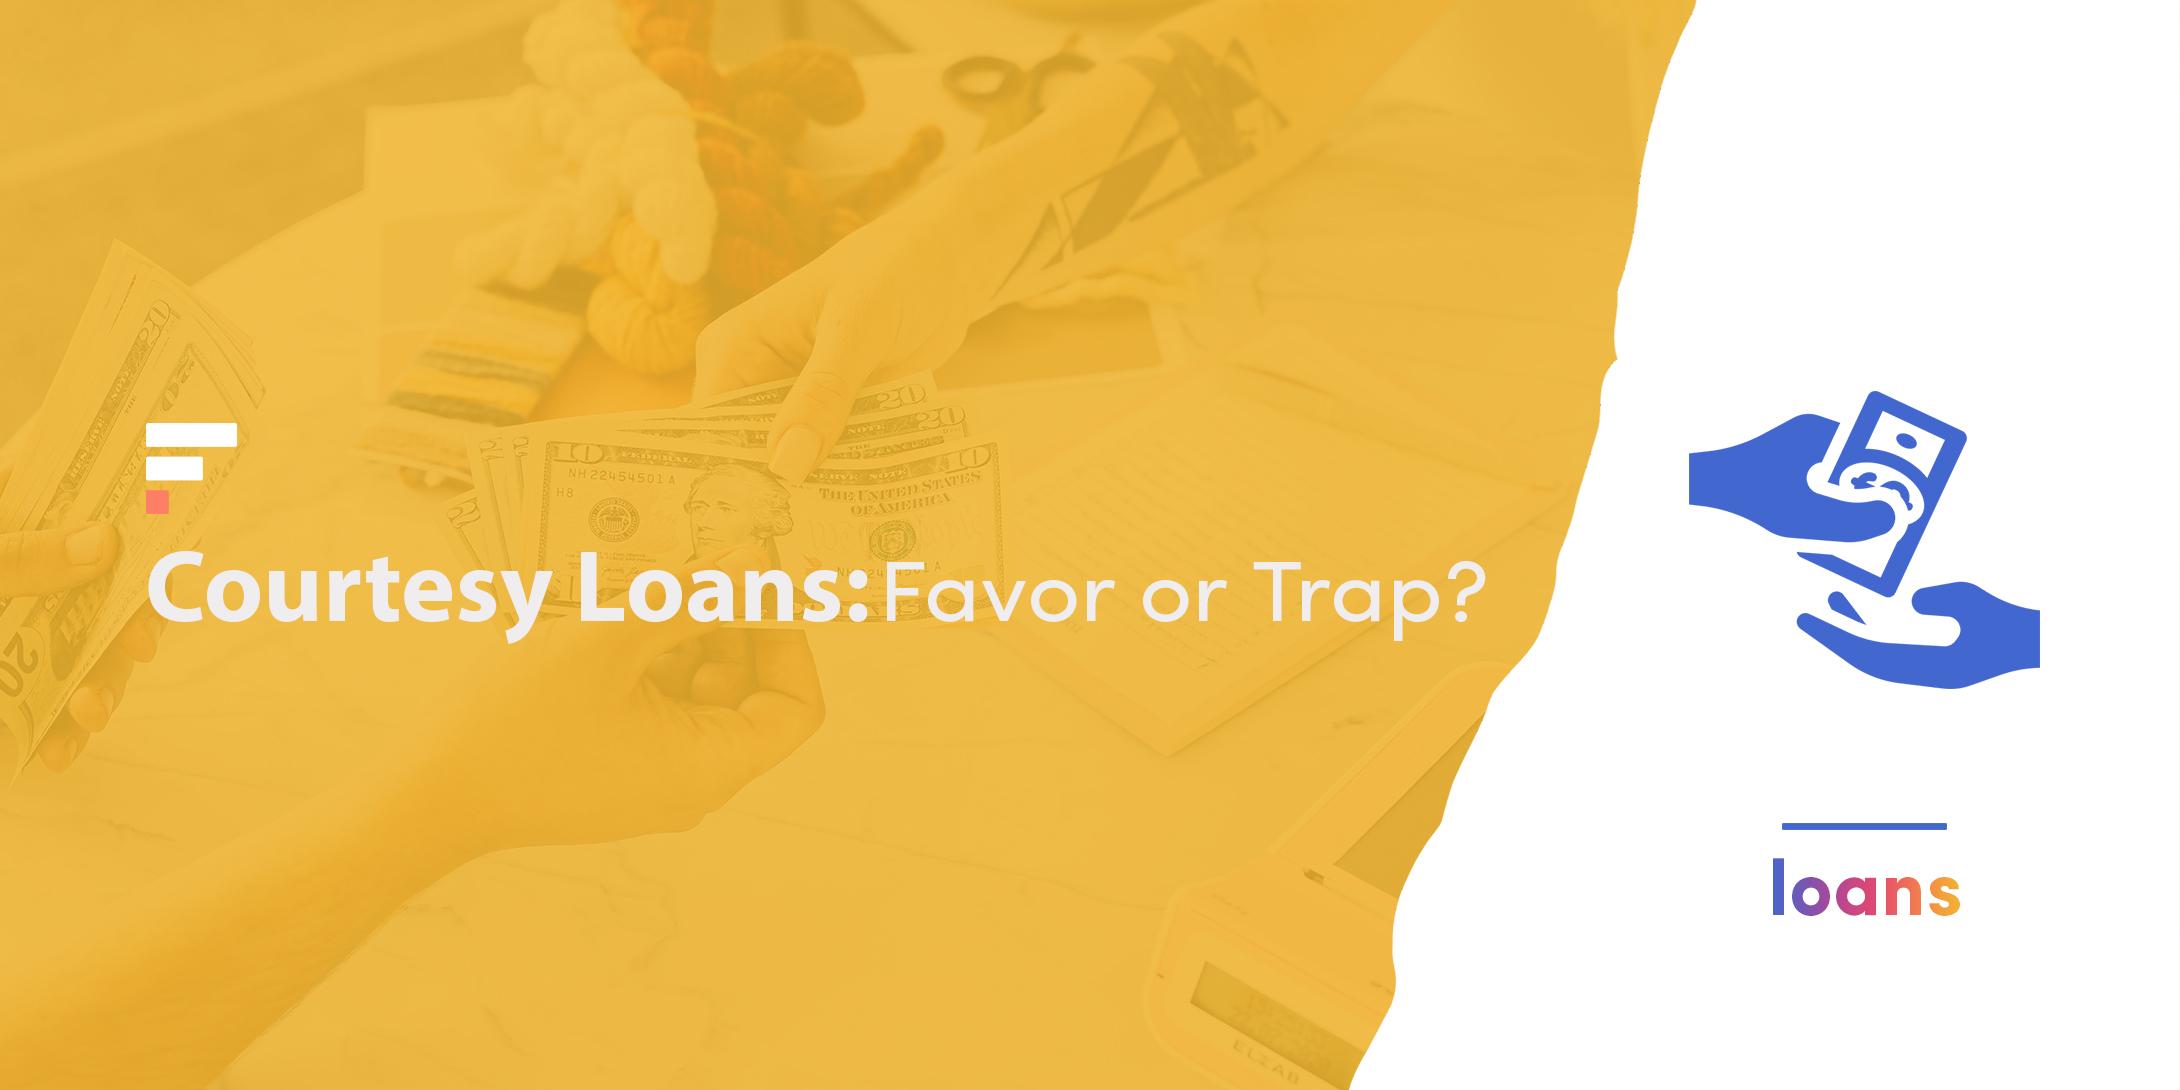 Courtesy loans